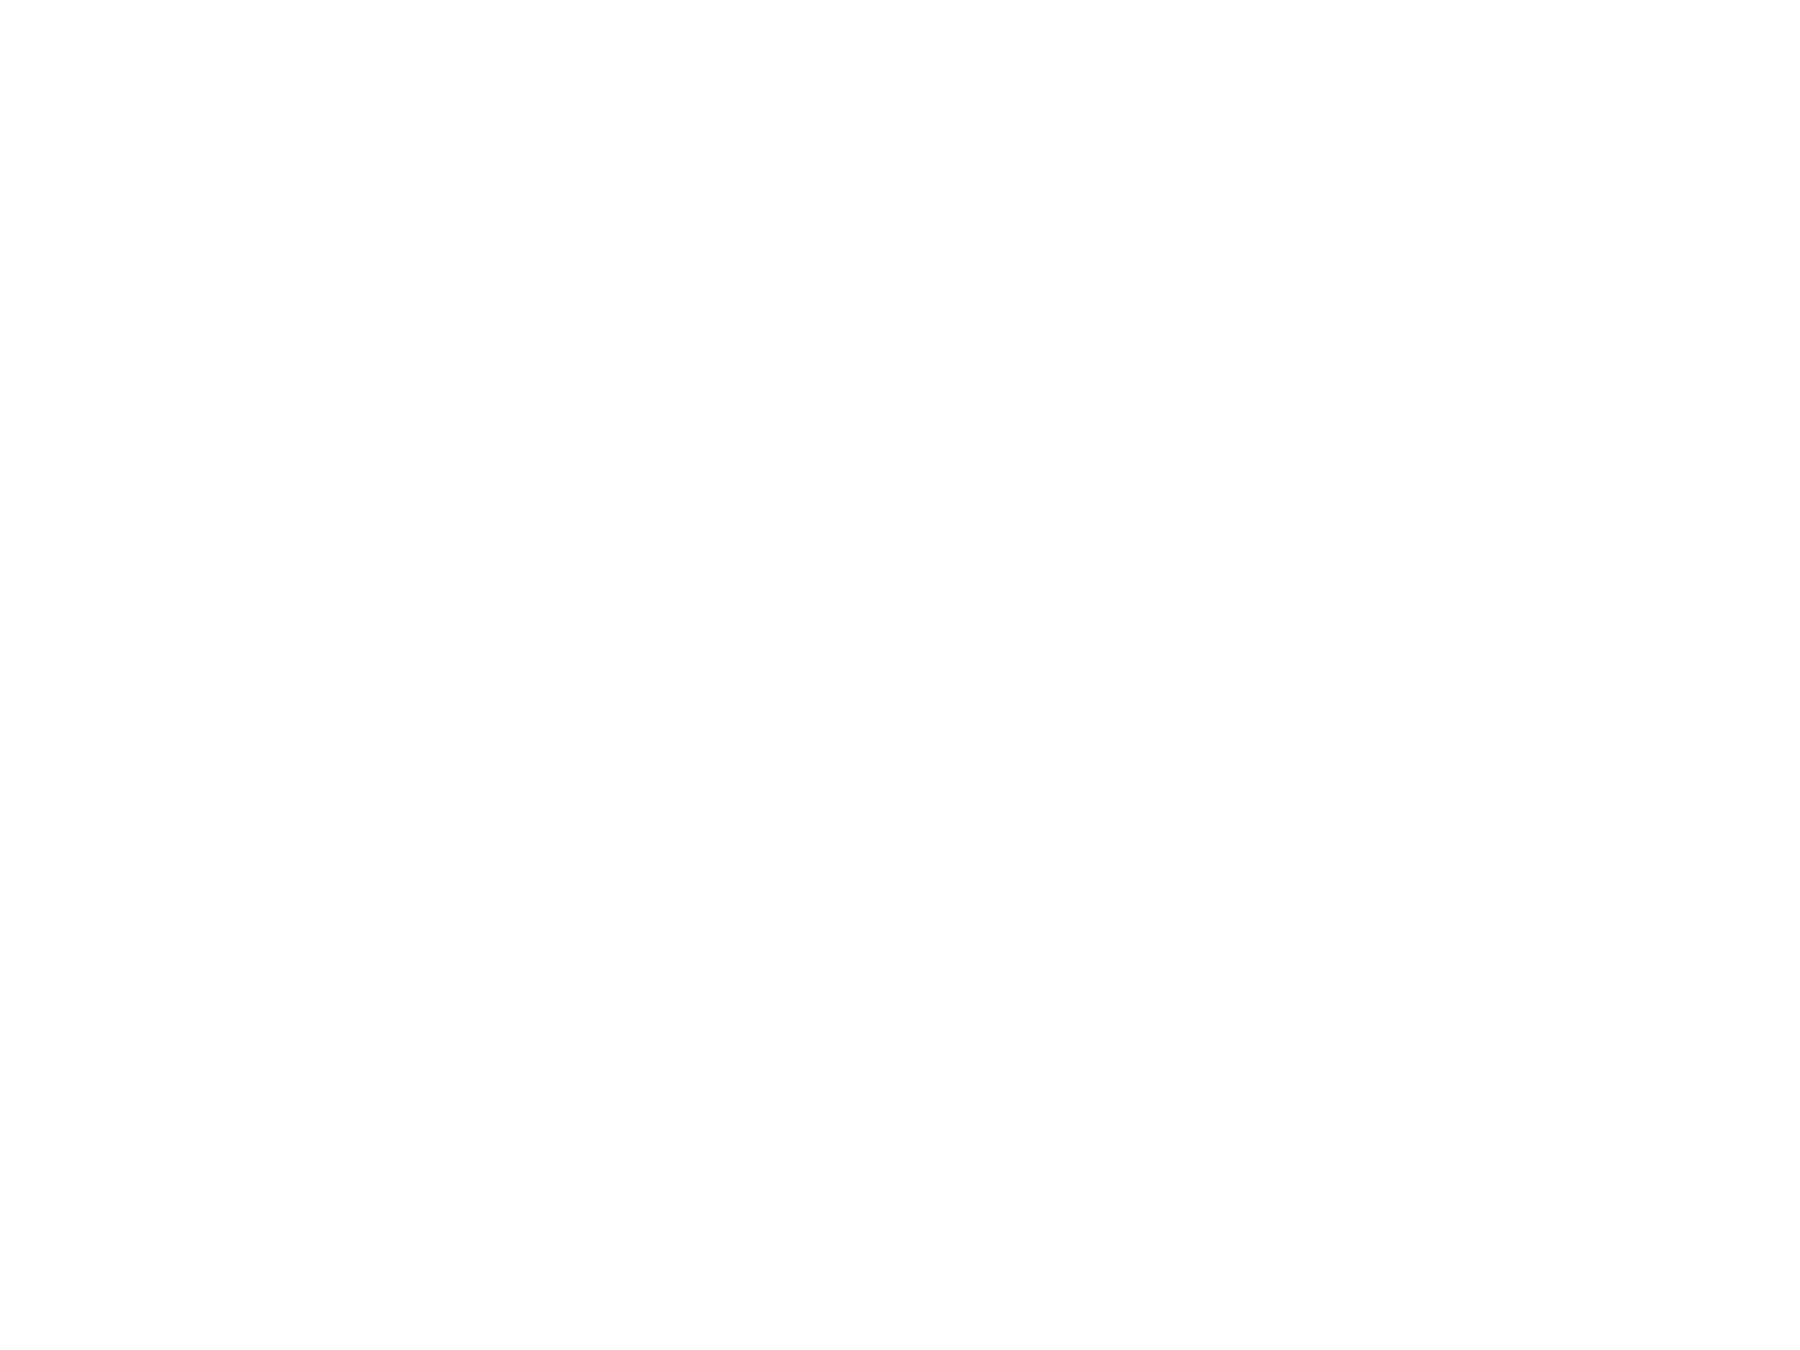 Symcon GmbH